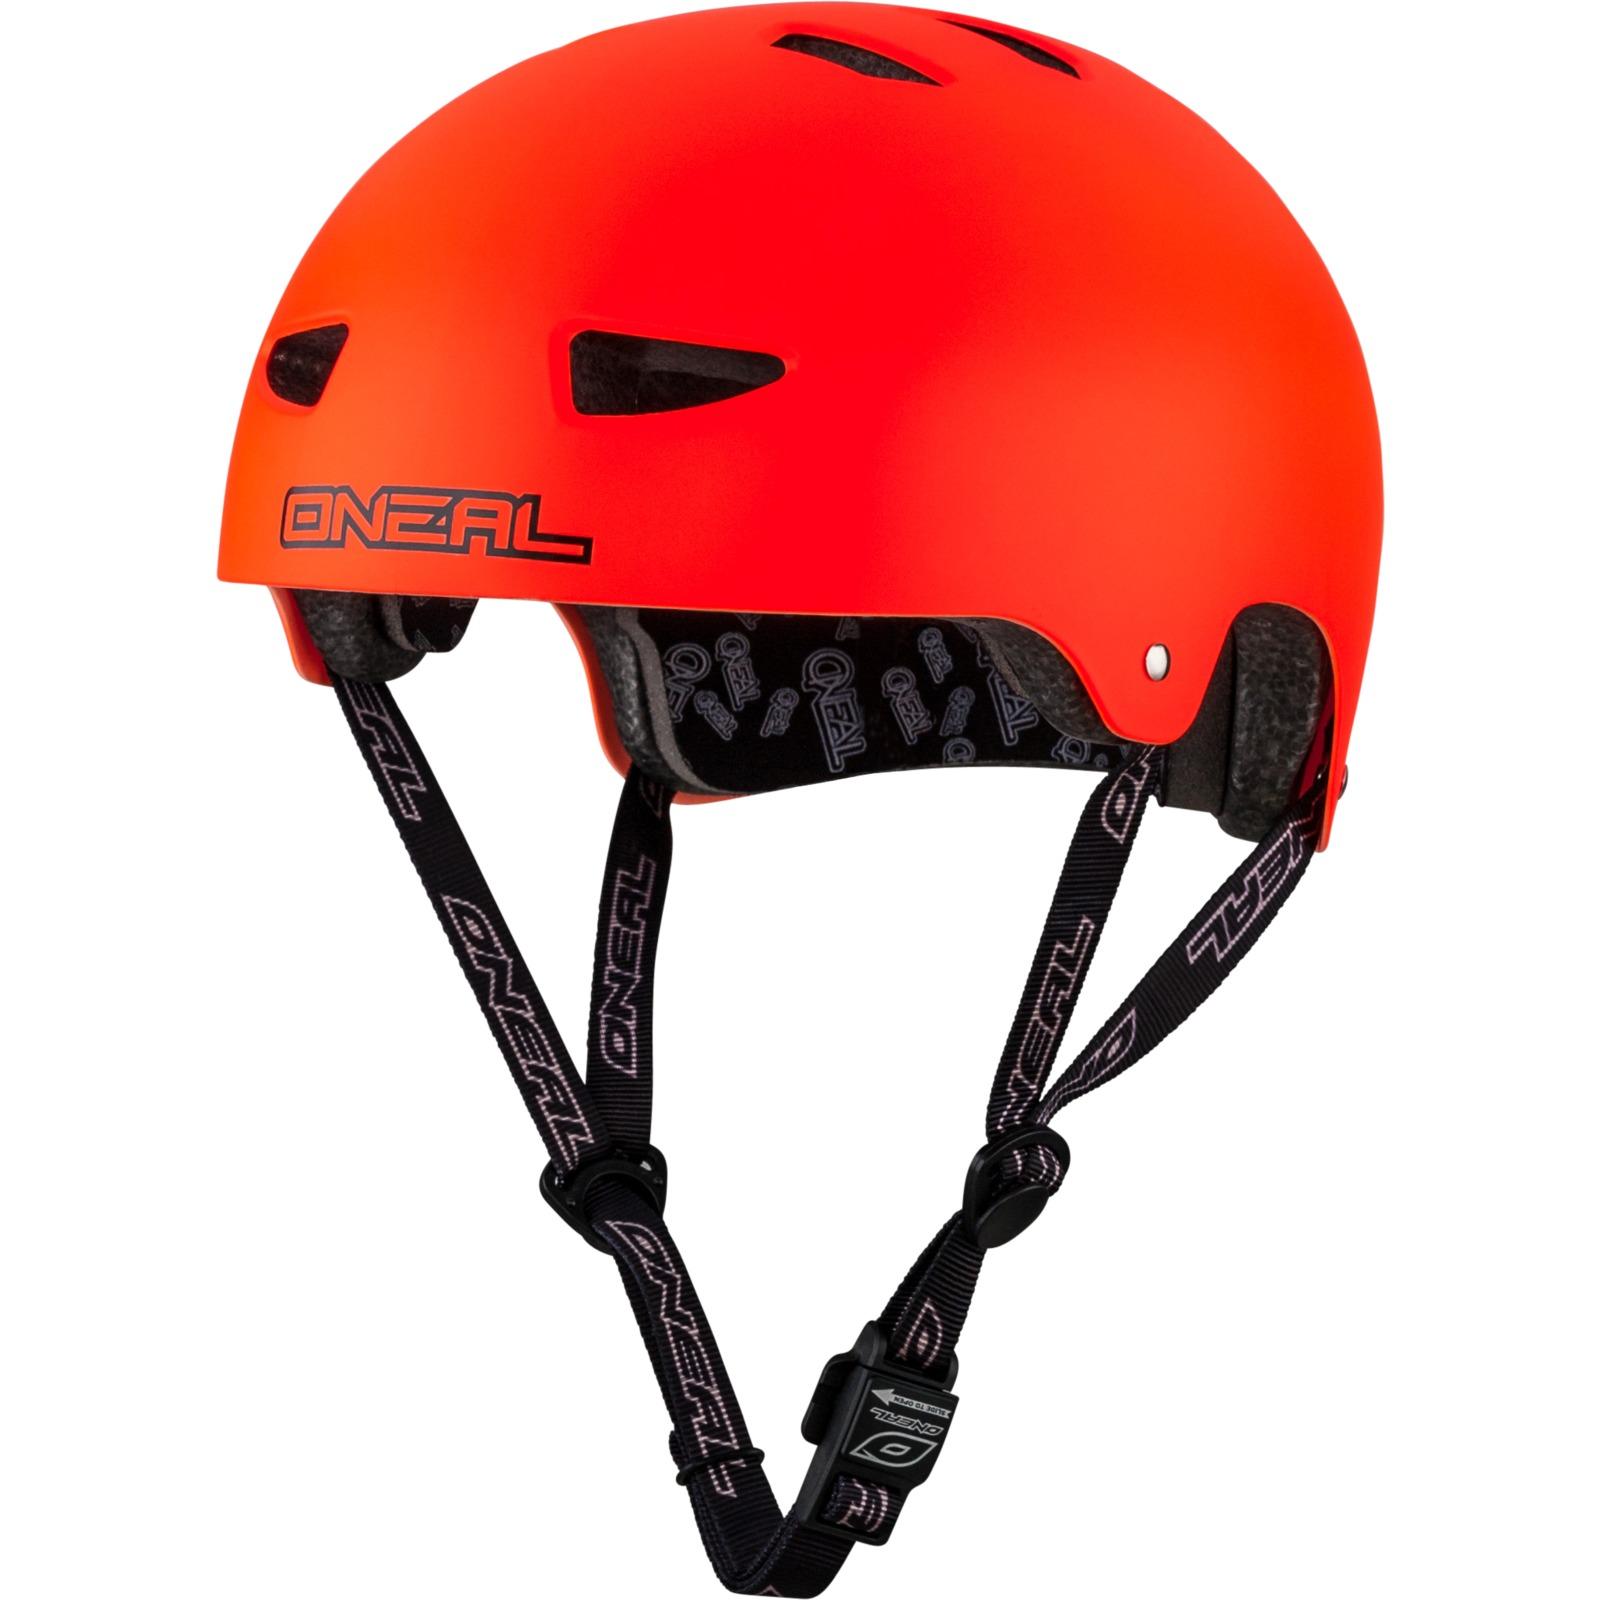 Oneal Dirt Lid Matt Neon Red Cycle Helmet Bmx Skate Adult